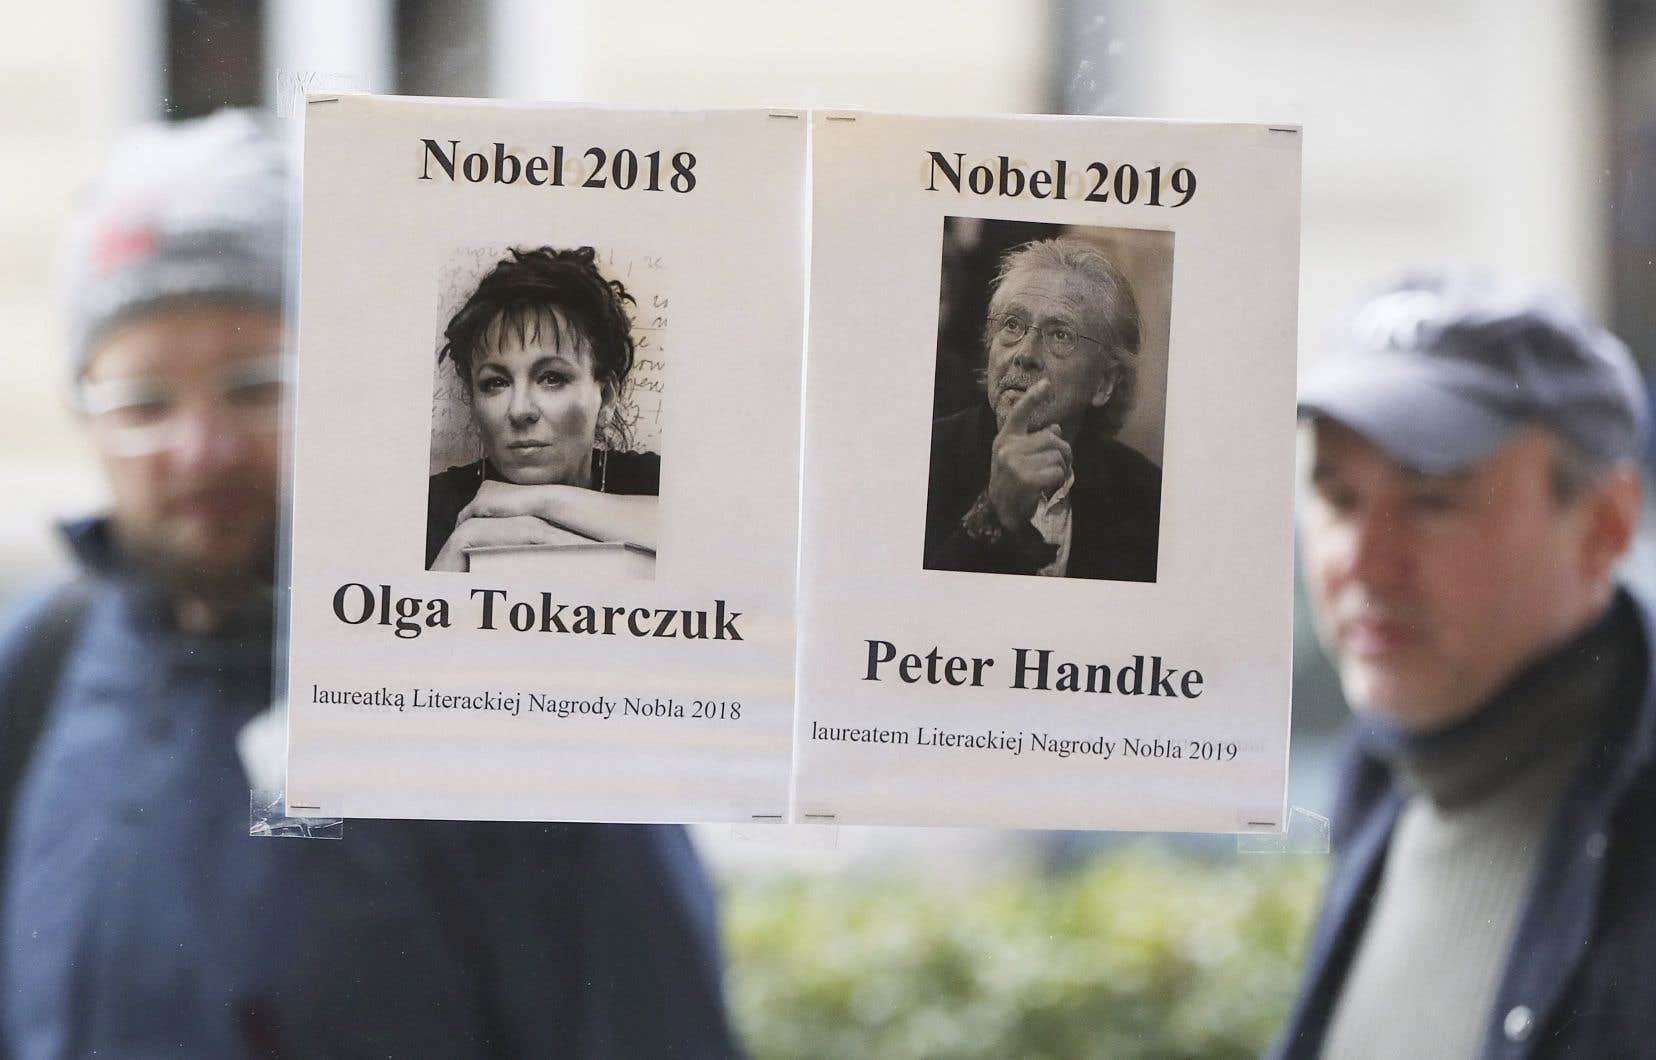 Olga Tokarczuk et Peter Handke, Prix Nobel de littérature